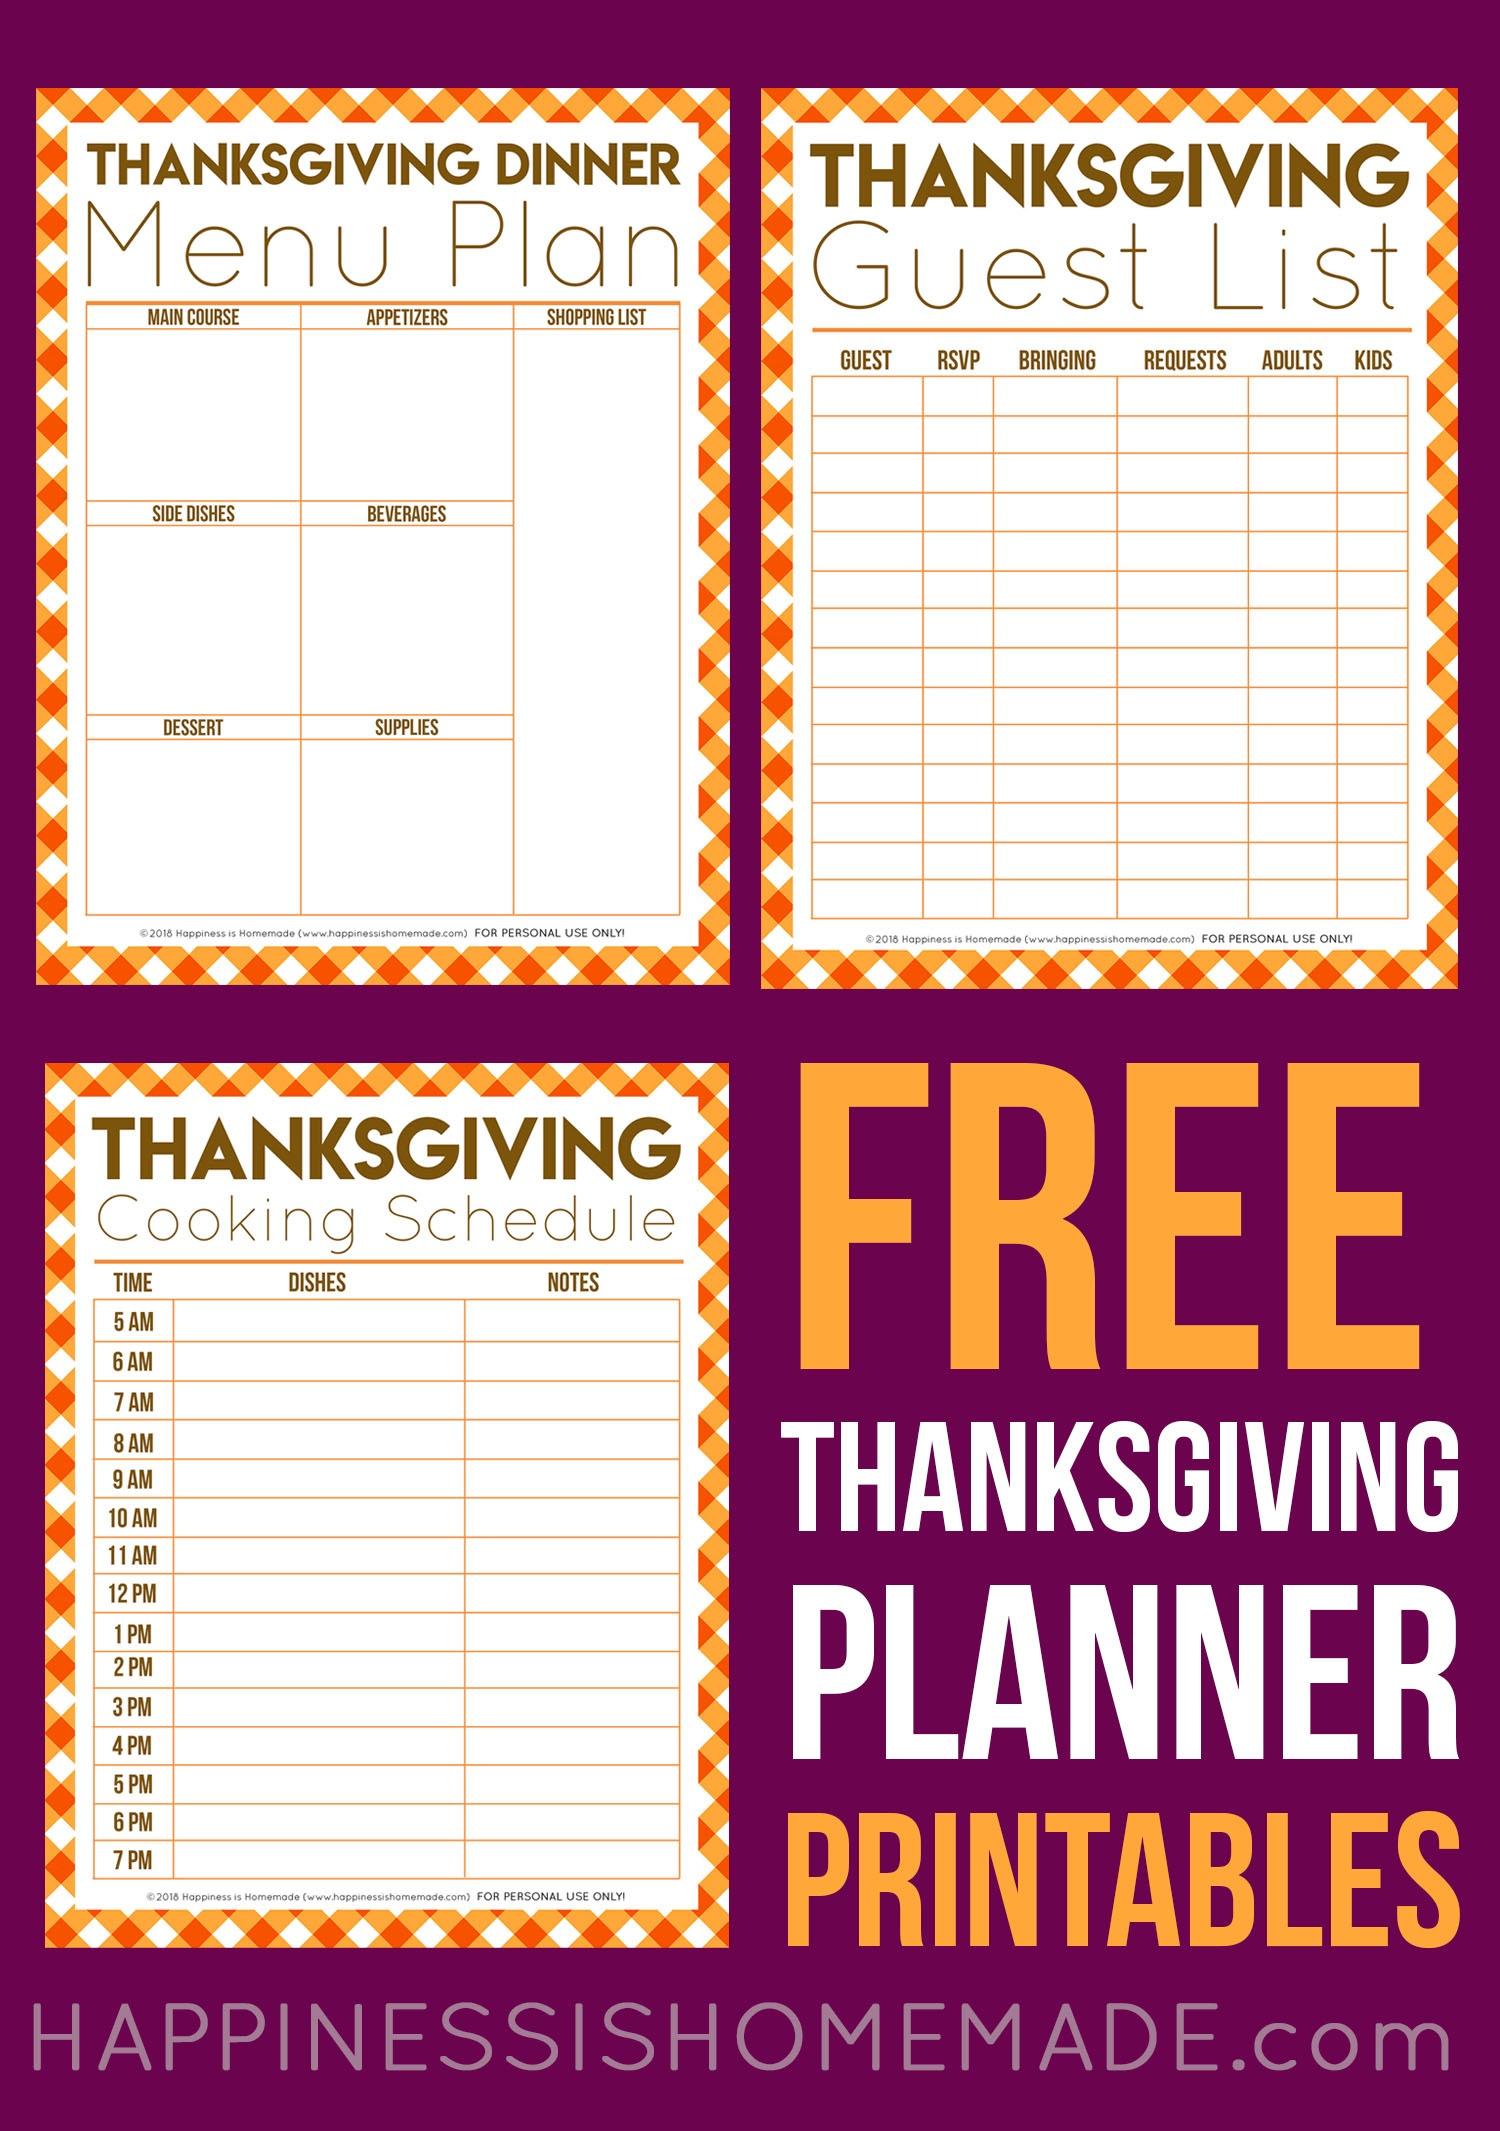 Free Thanksgiving Printables - Menu Planner, Guest List, & More - Free Printable For Thanksgiving